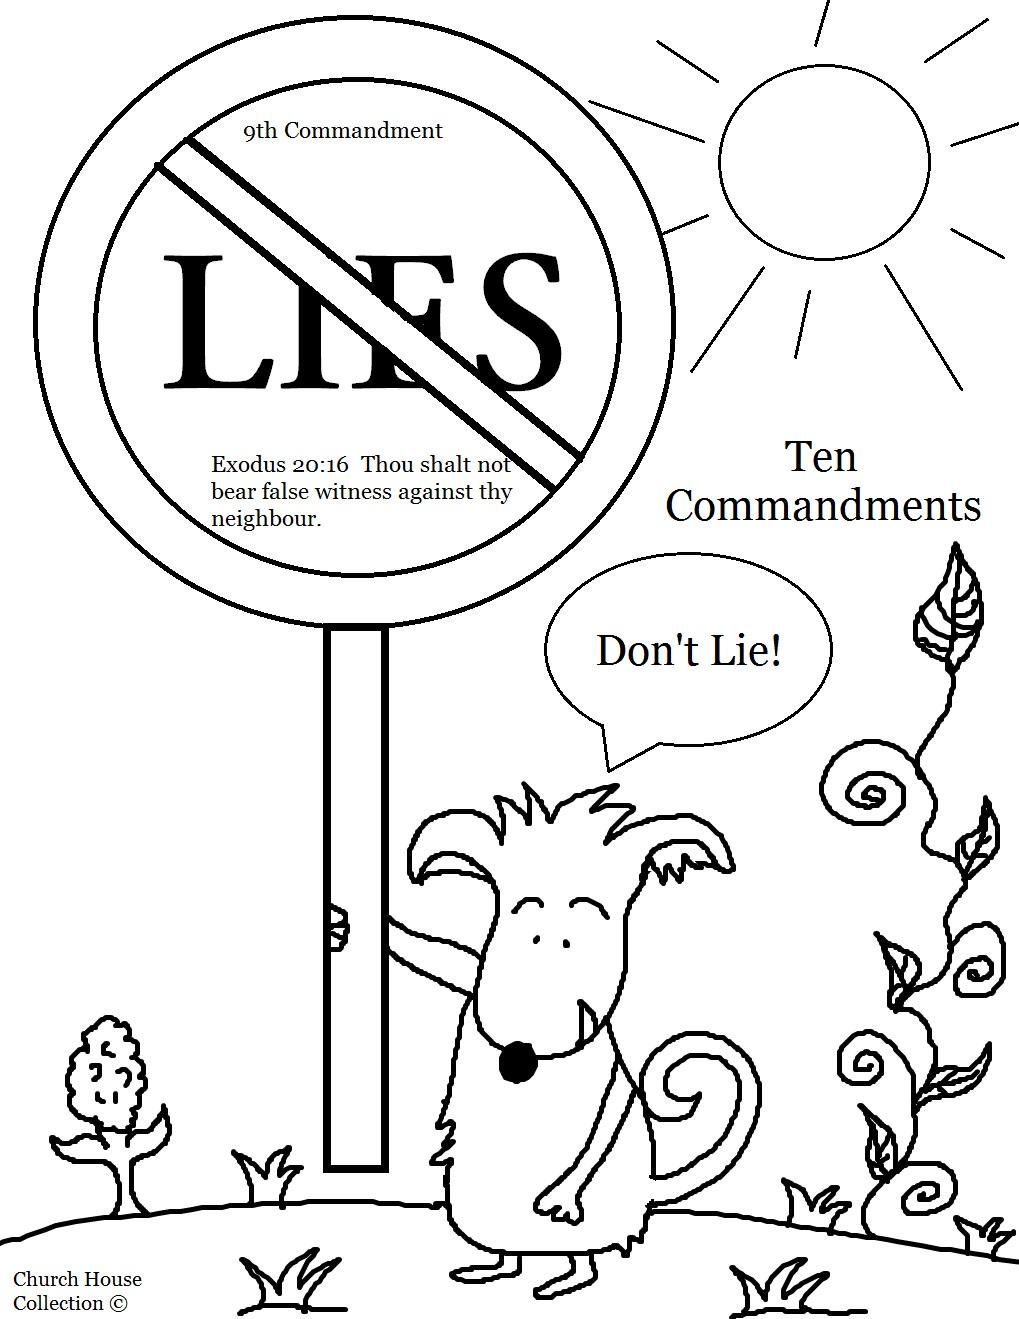 10 Commandments Coloring Page